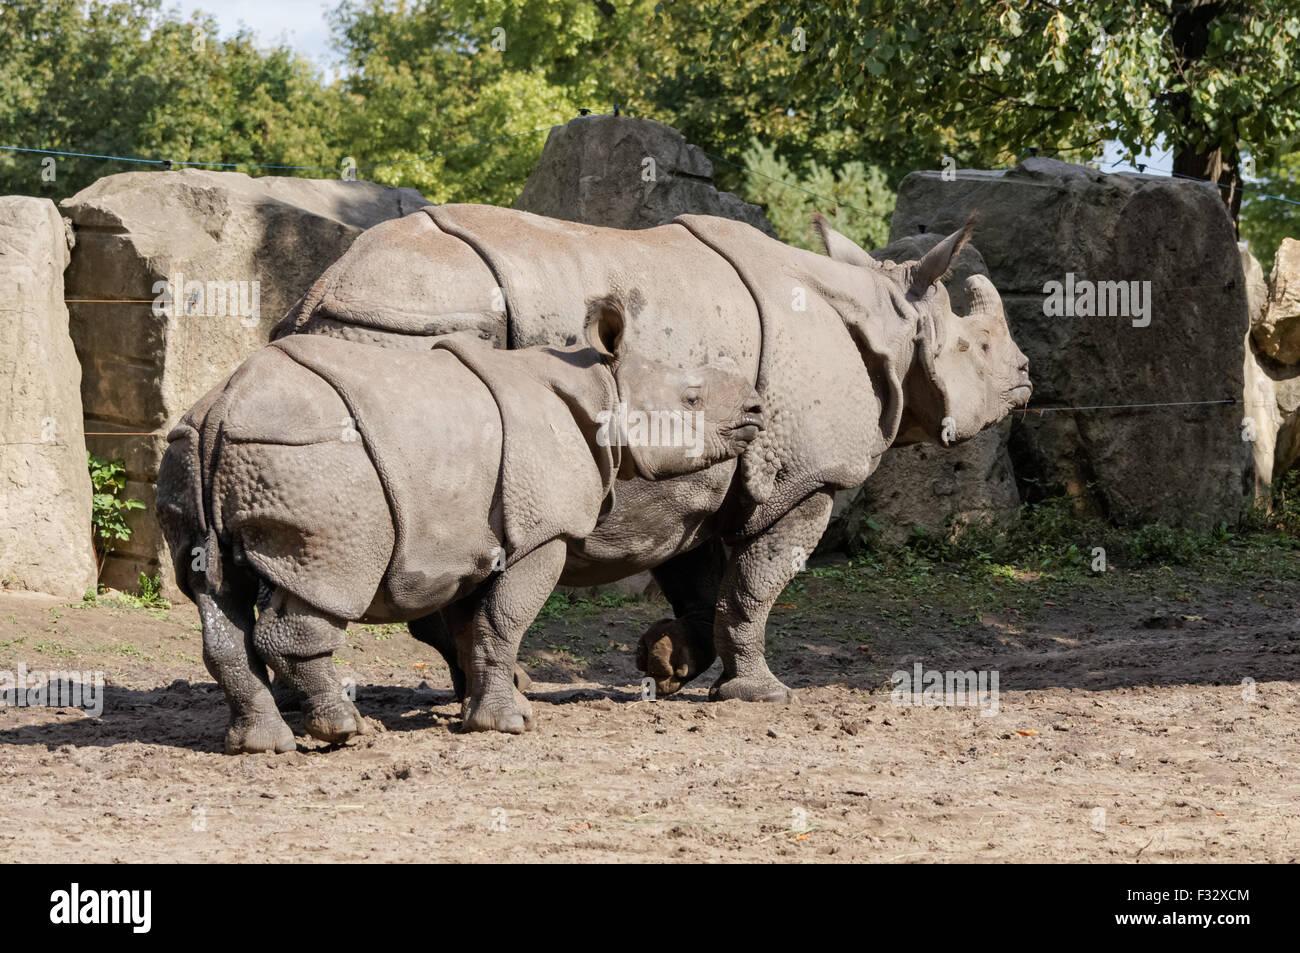 The Indian rhinoceros (Rhinoceros unicornis) at Warsaw Zoo, Poland - Stock Image